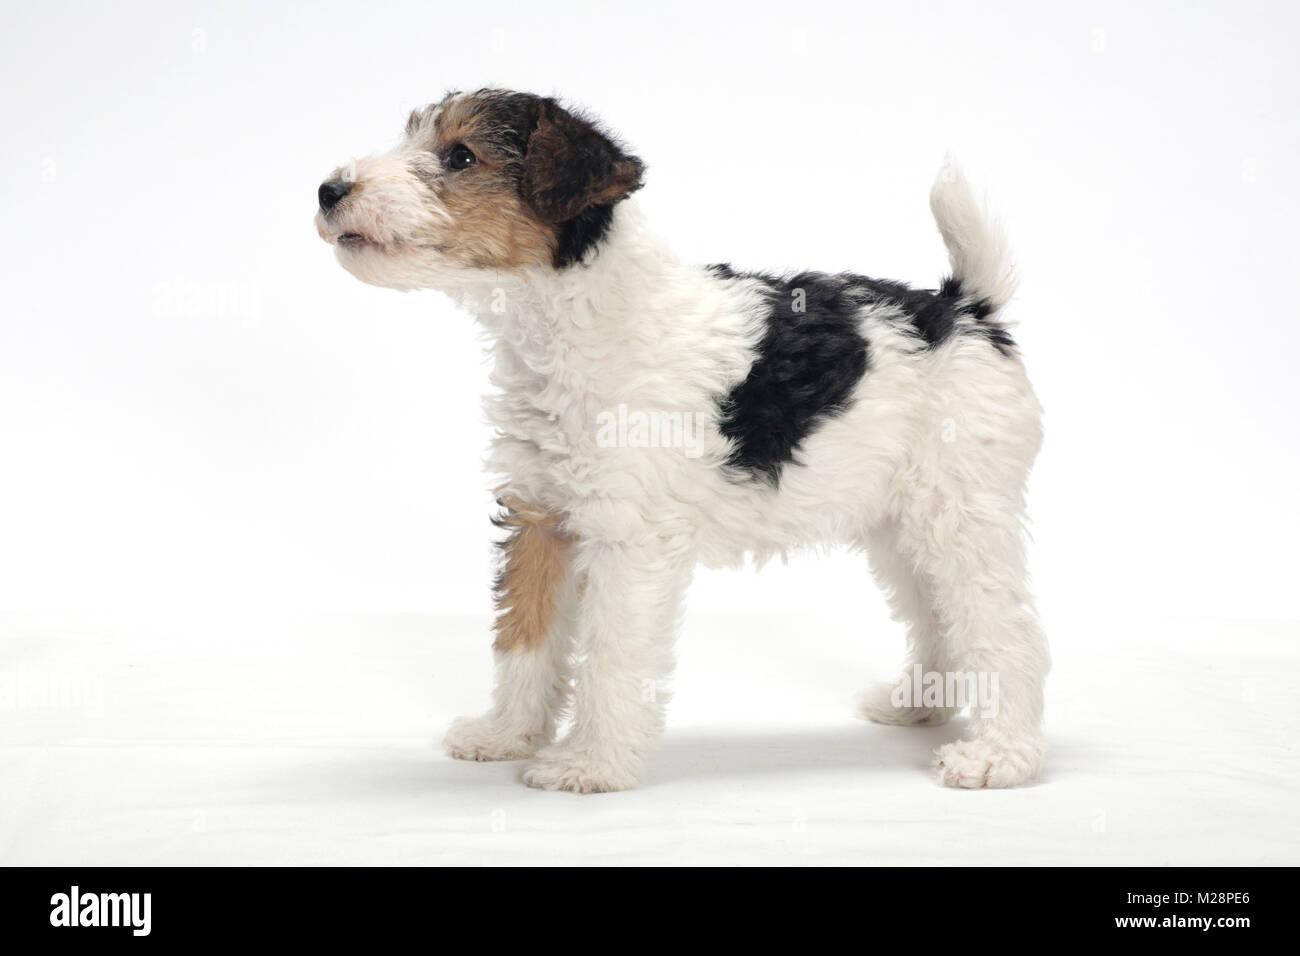 Fox Terrier Wirehair Stock Photos & Fox Terrier Wirehair Stock ...